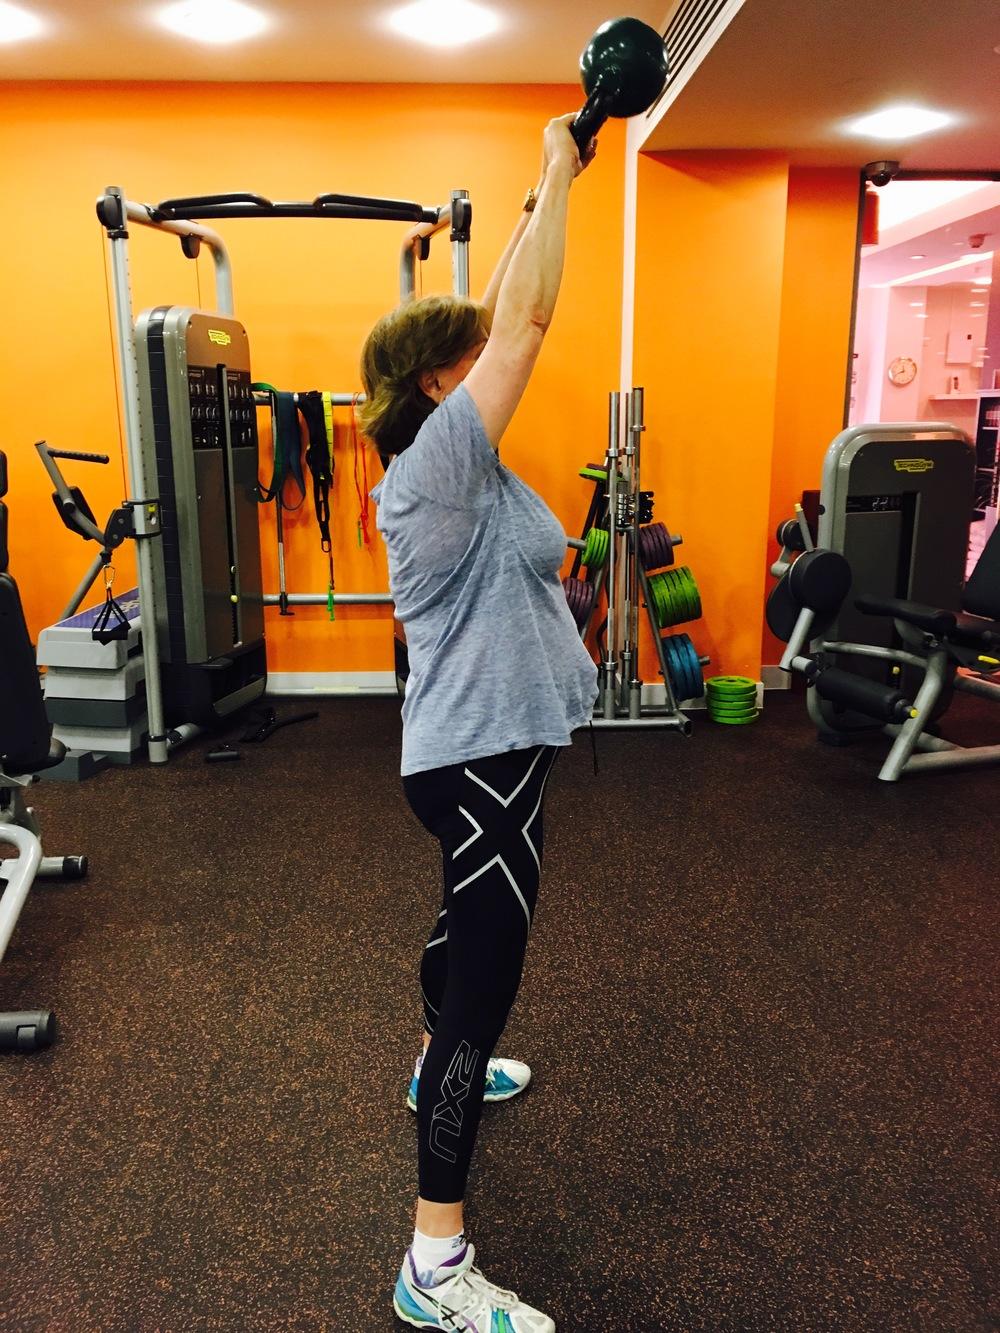 Scandinavian Fitness, Personal Training, Notting Hill, Chelsea, Kensington, Holland Park, Gym Training, Fitness, Training, Female Personal Trainers, London